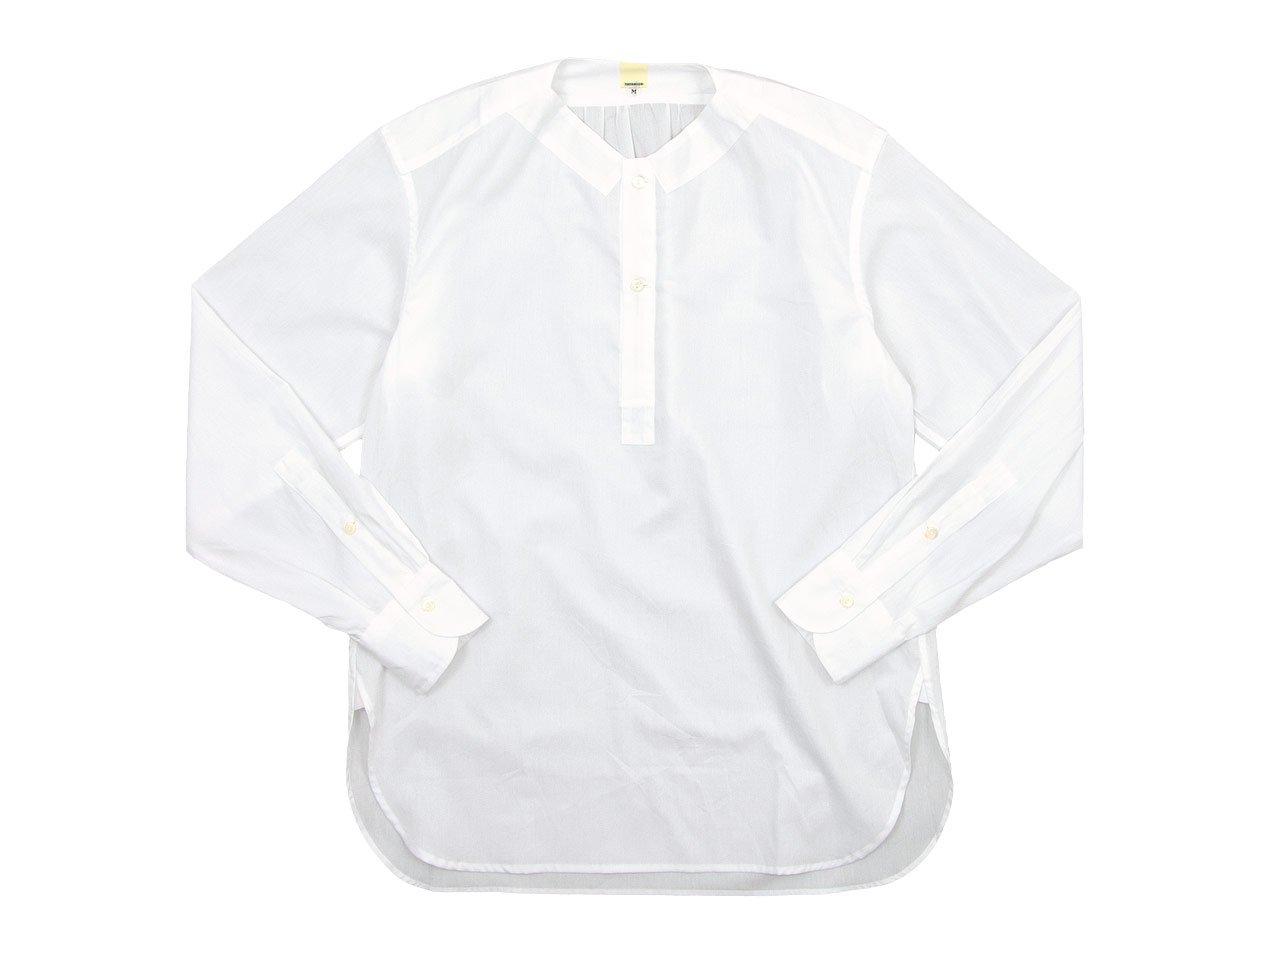 TATAMIZE NO COLLAR SHIRTS WHITE